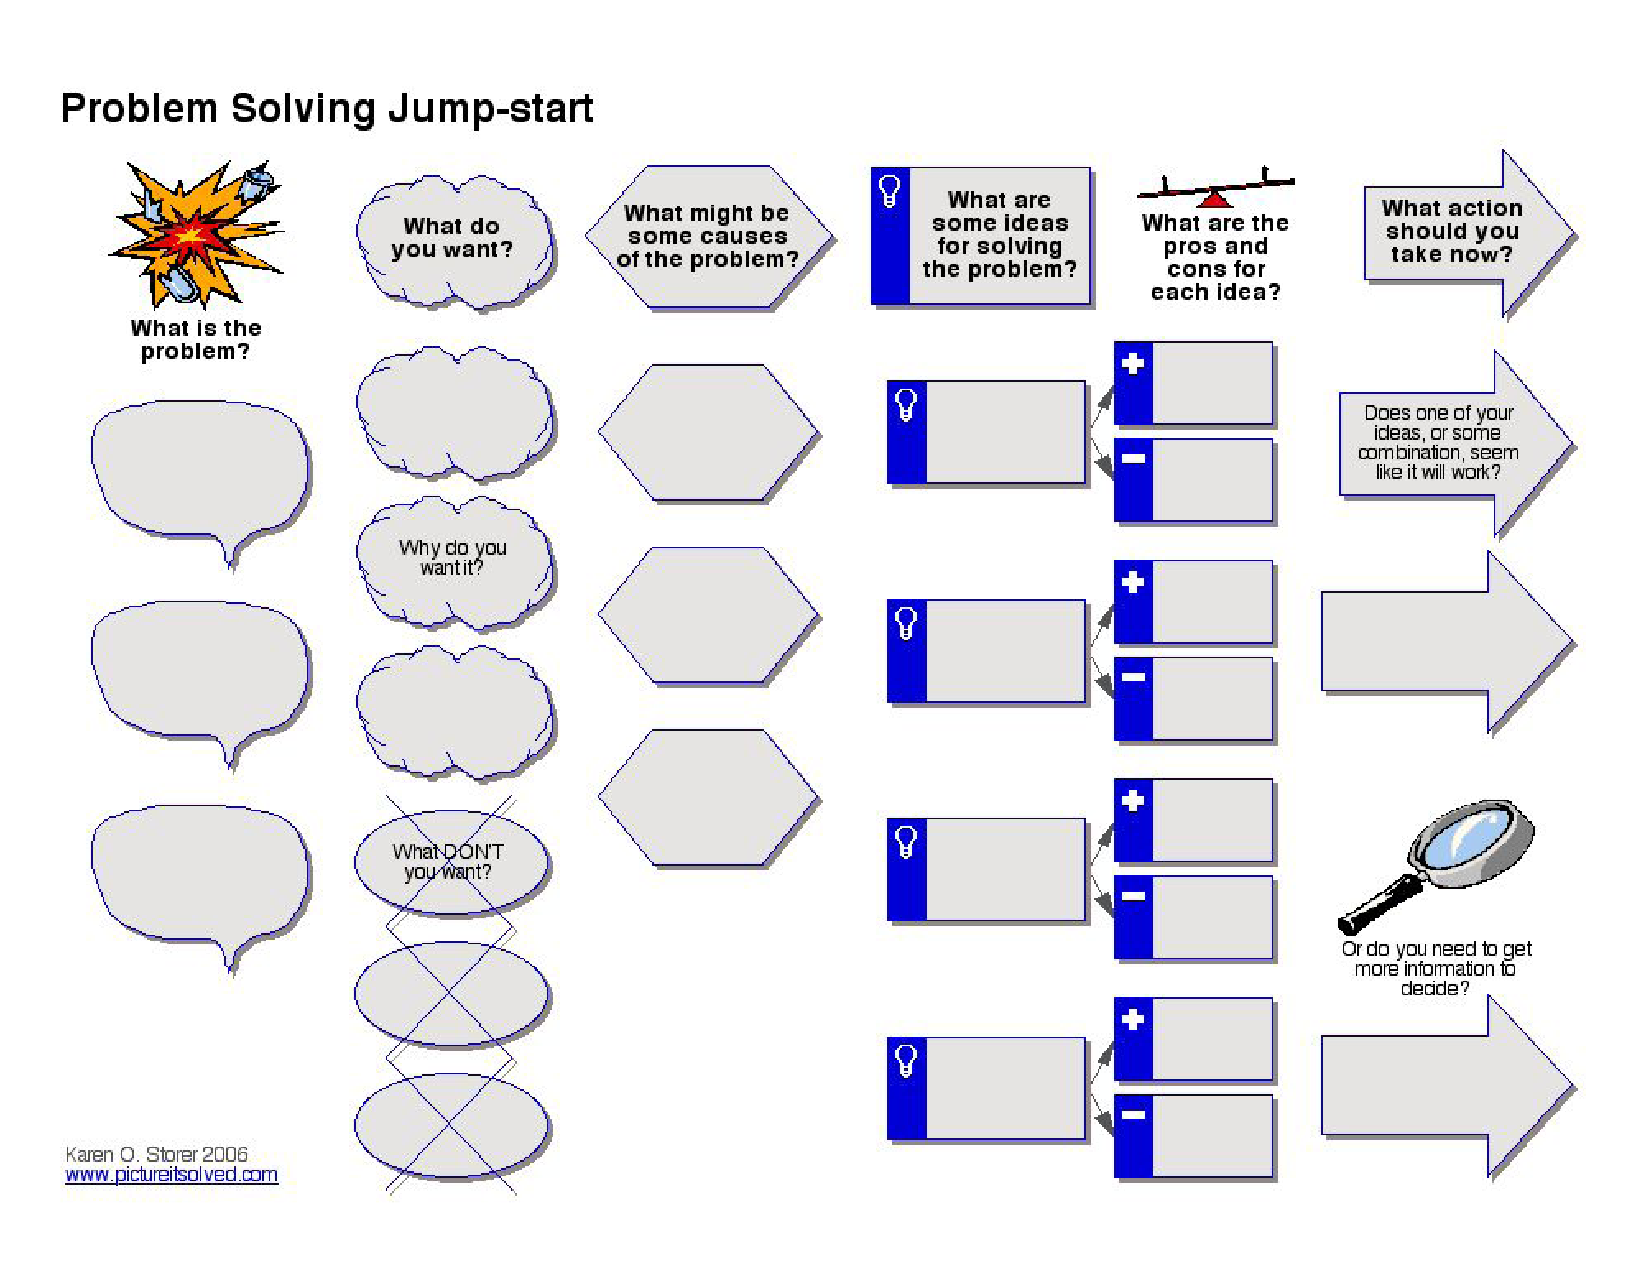 Problem solving basics | picture it solved